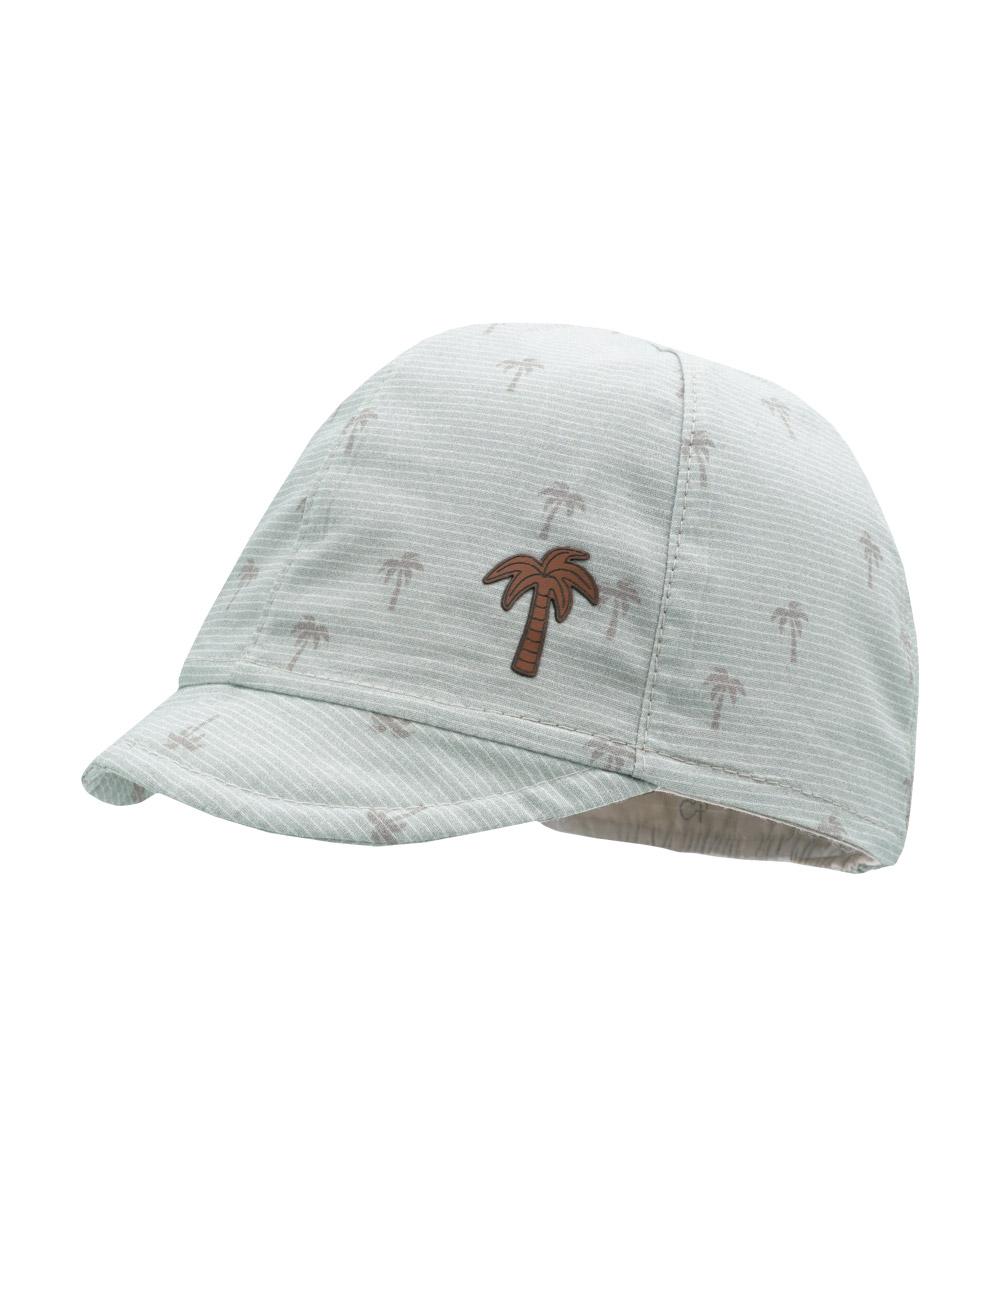 BOY-Cap Palmen 43 Maximo. Farbe: nebelgrau-lamm-palme, Größe: 43